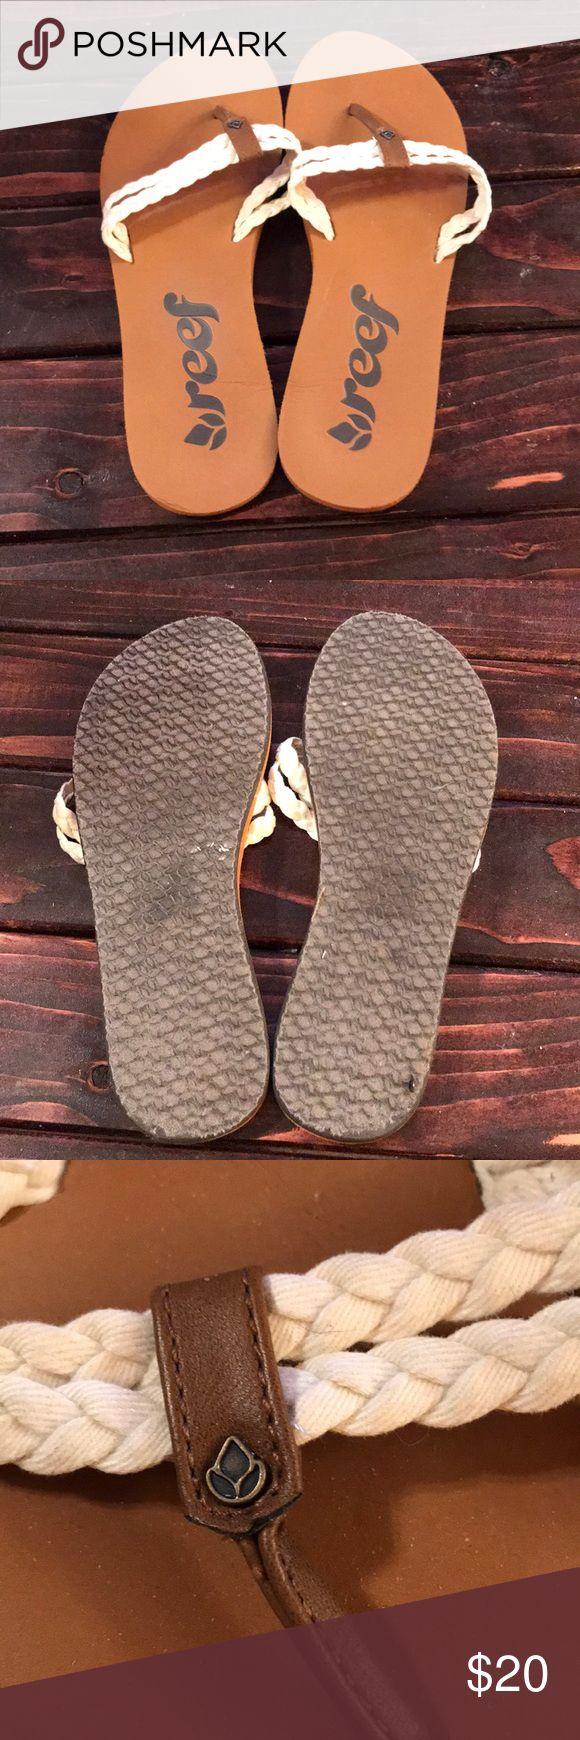 Reef flip flops Reef flip flops. Wore once!  In very good condition Reef Shoes Sandals #flipflops